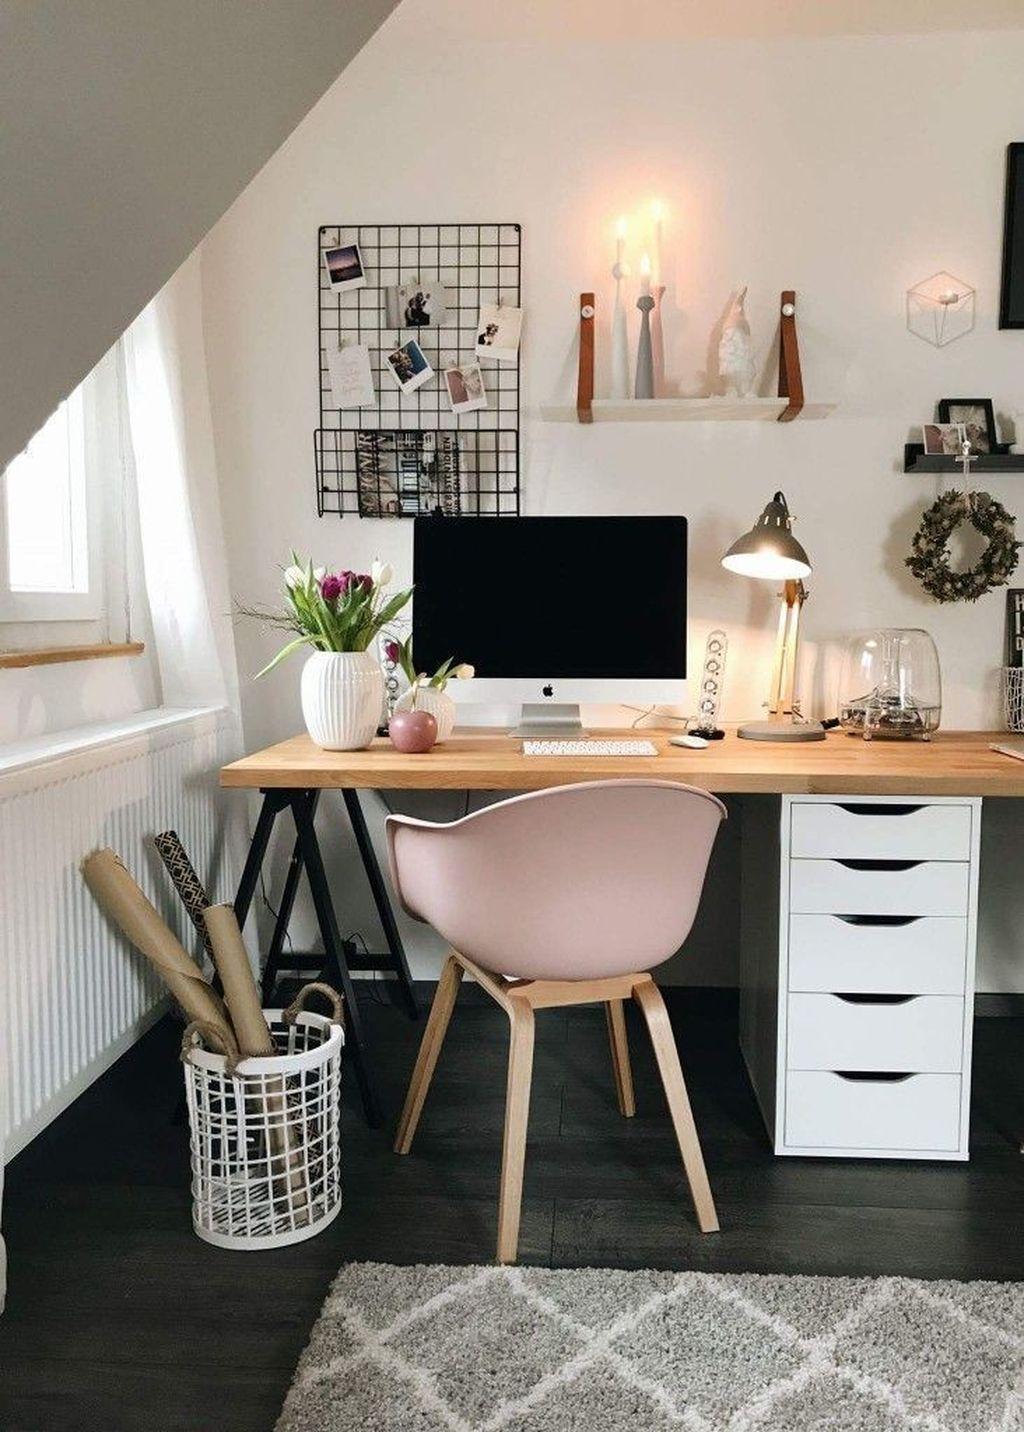 20 Shabby Chic Diy Home Decor Ideas In 2020 Study Room Decor Cute Desk Decor Home Office Design